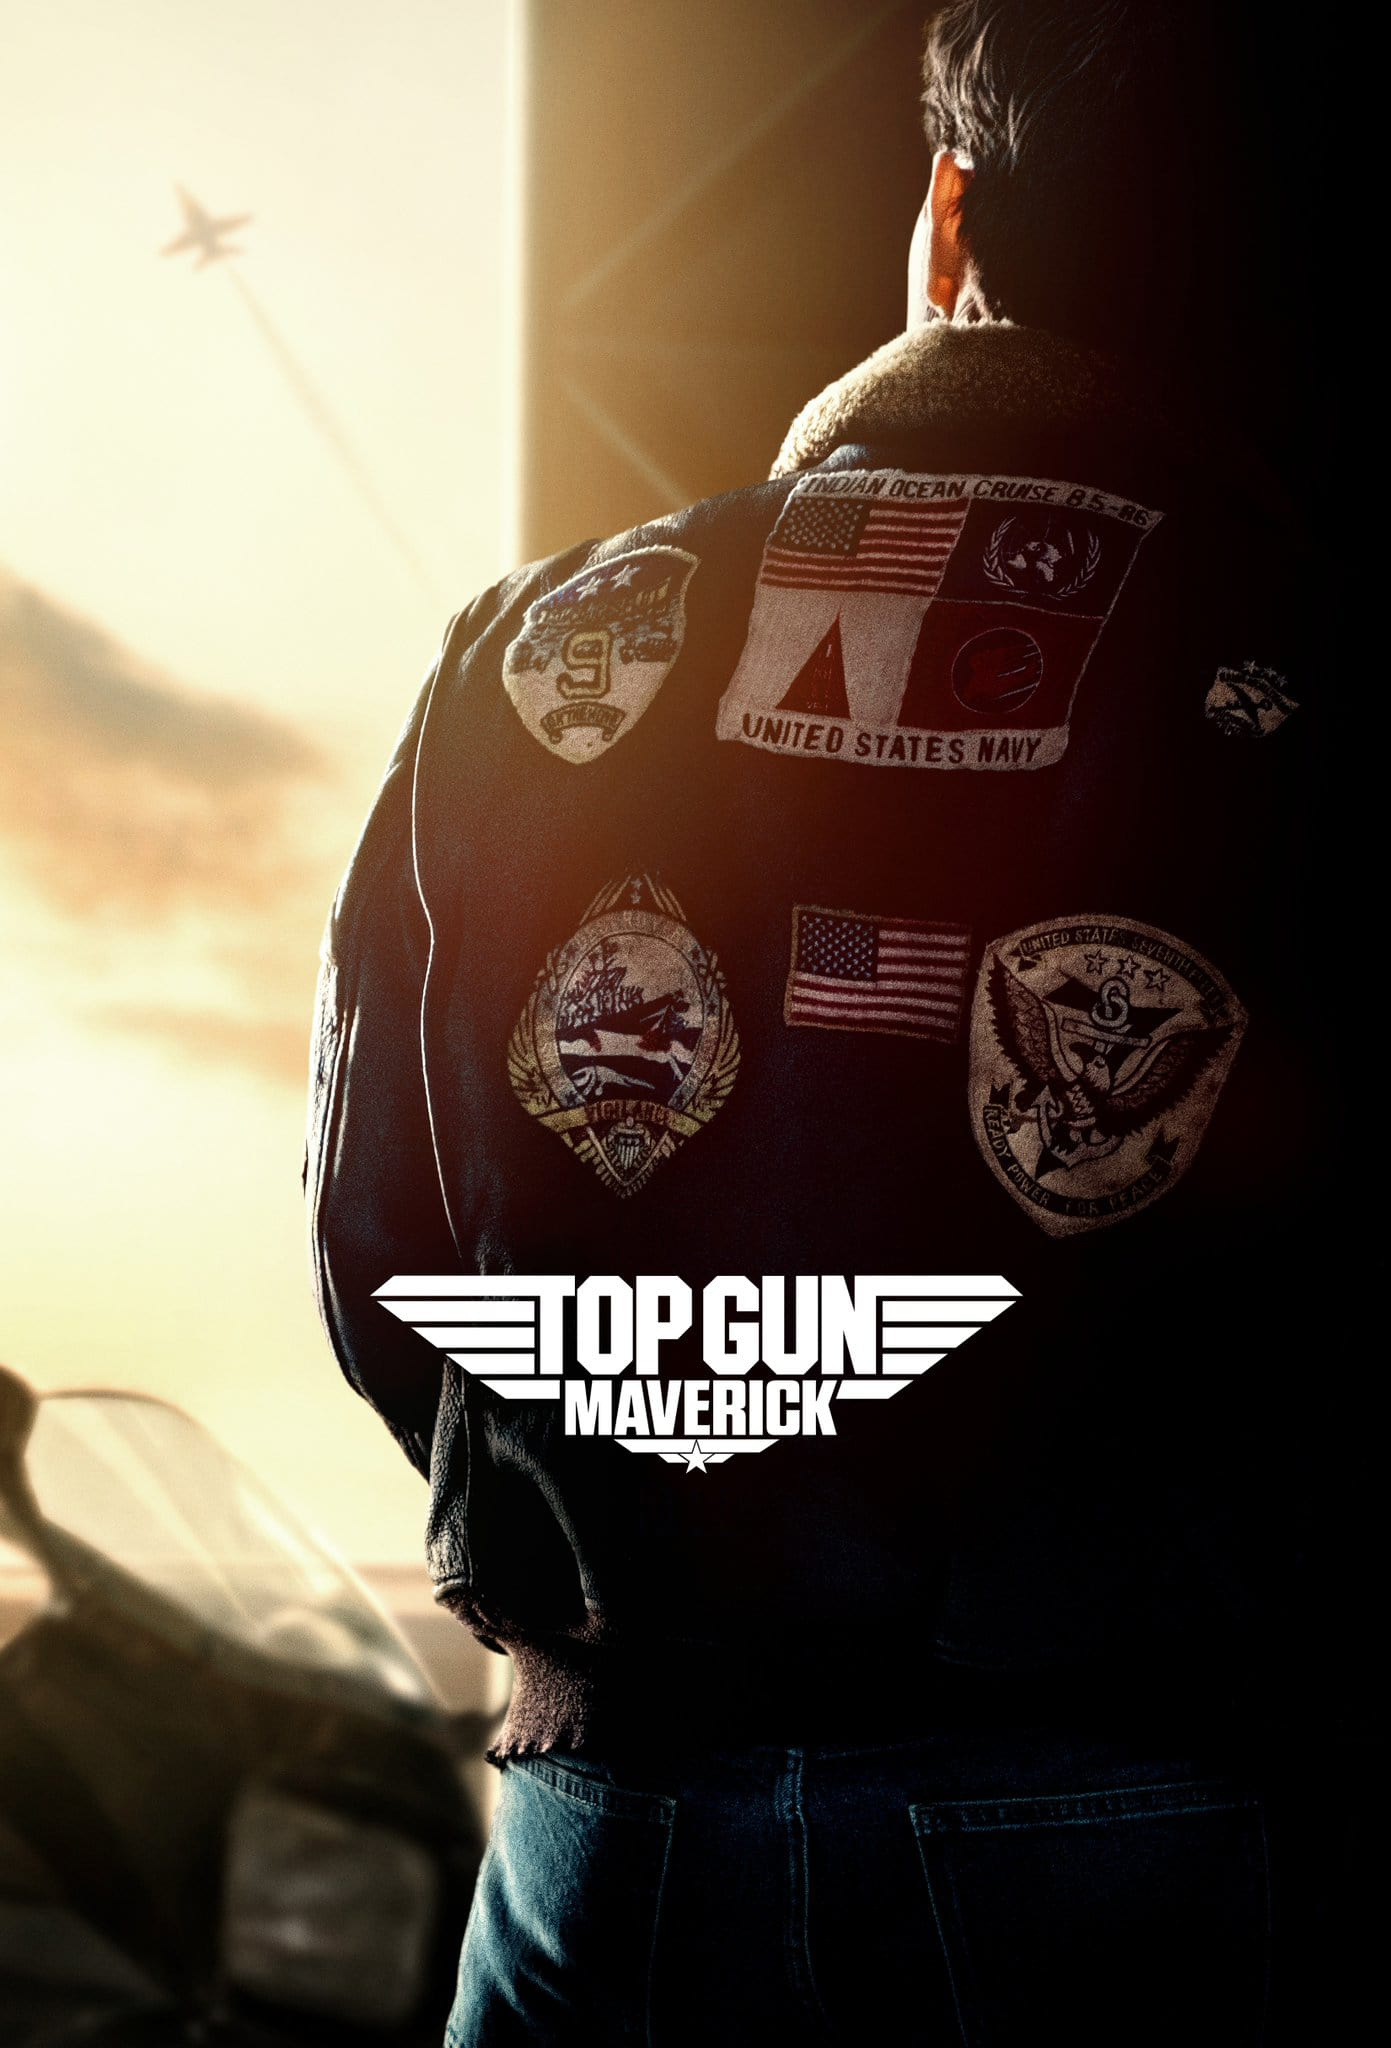 Top Gun: Maverick (2020) Official Trailer #1